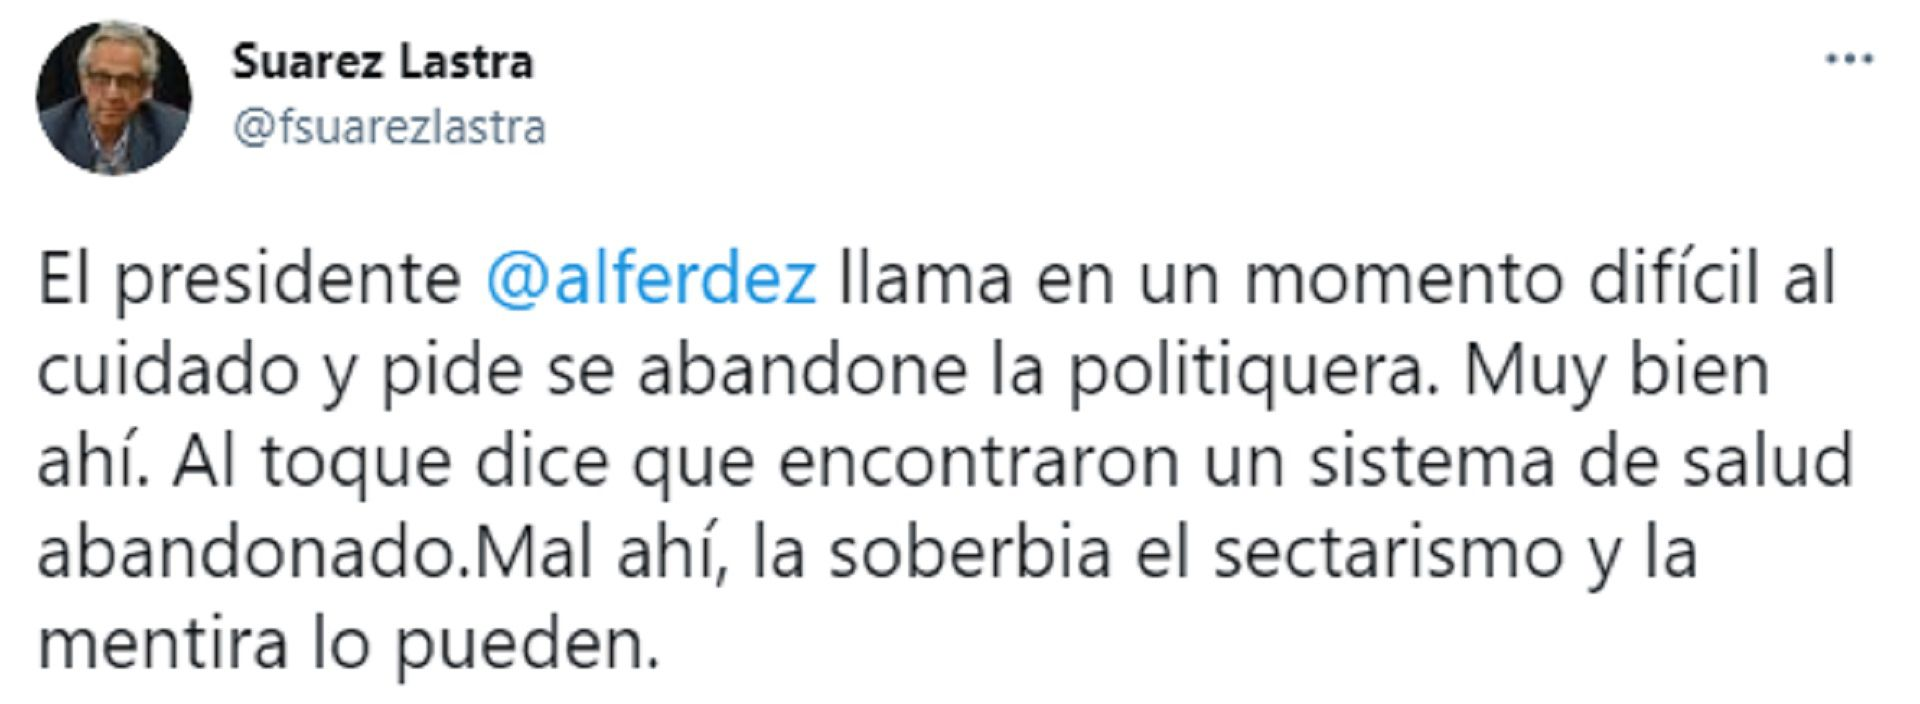 Facundo Suárez Lastra